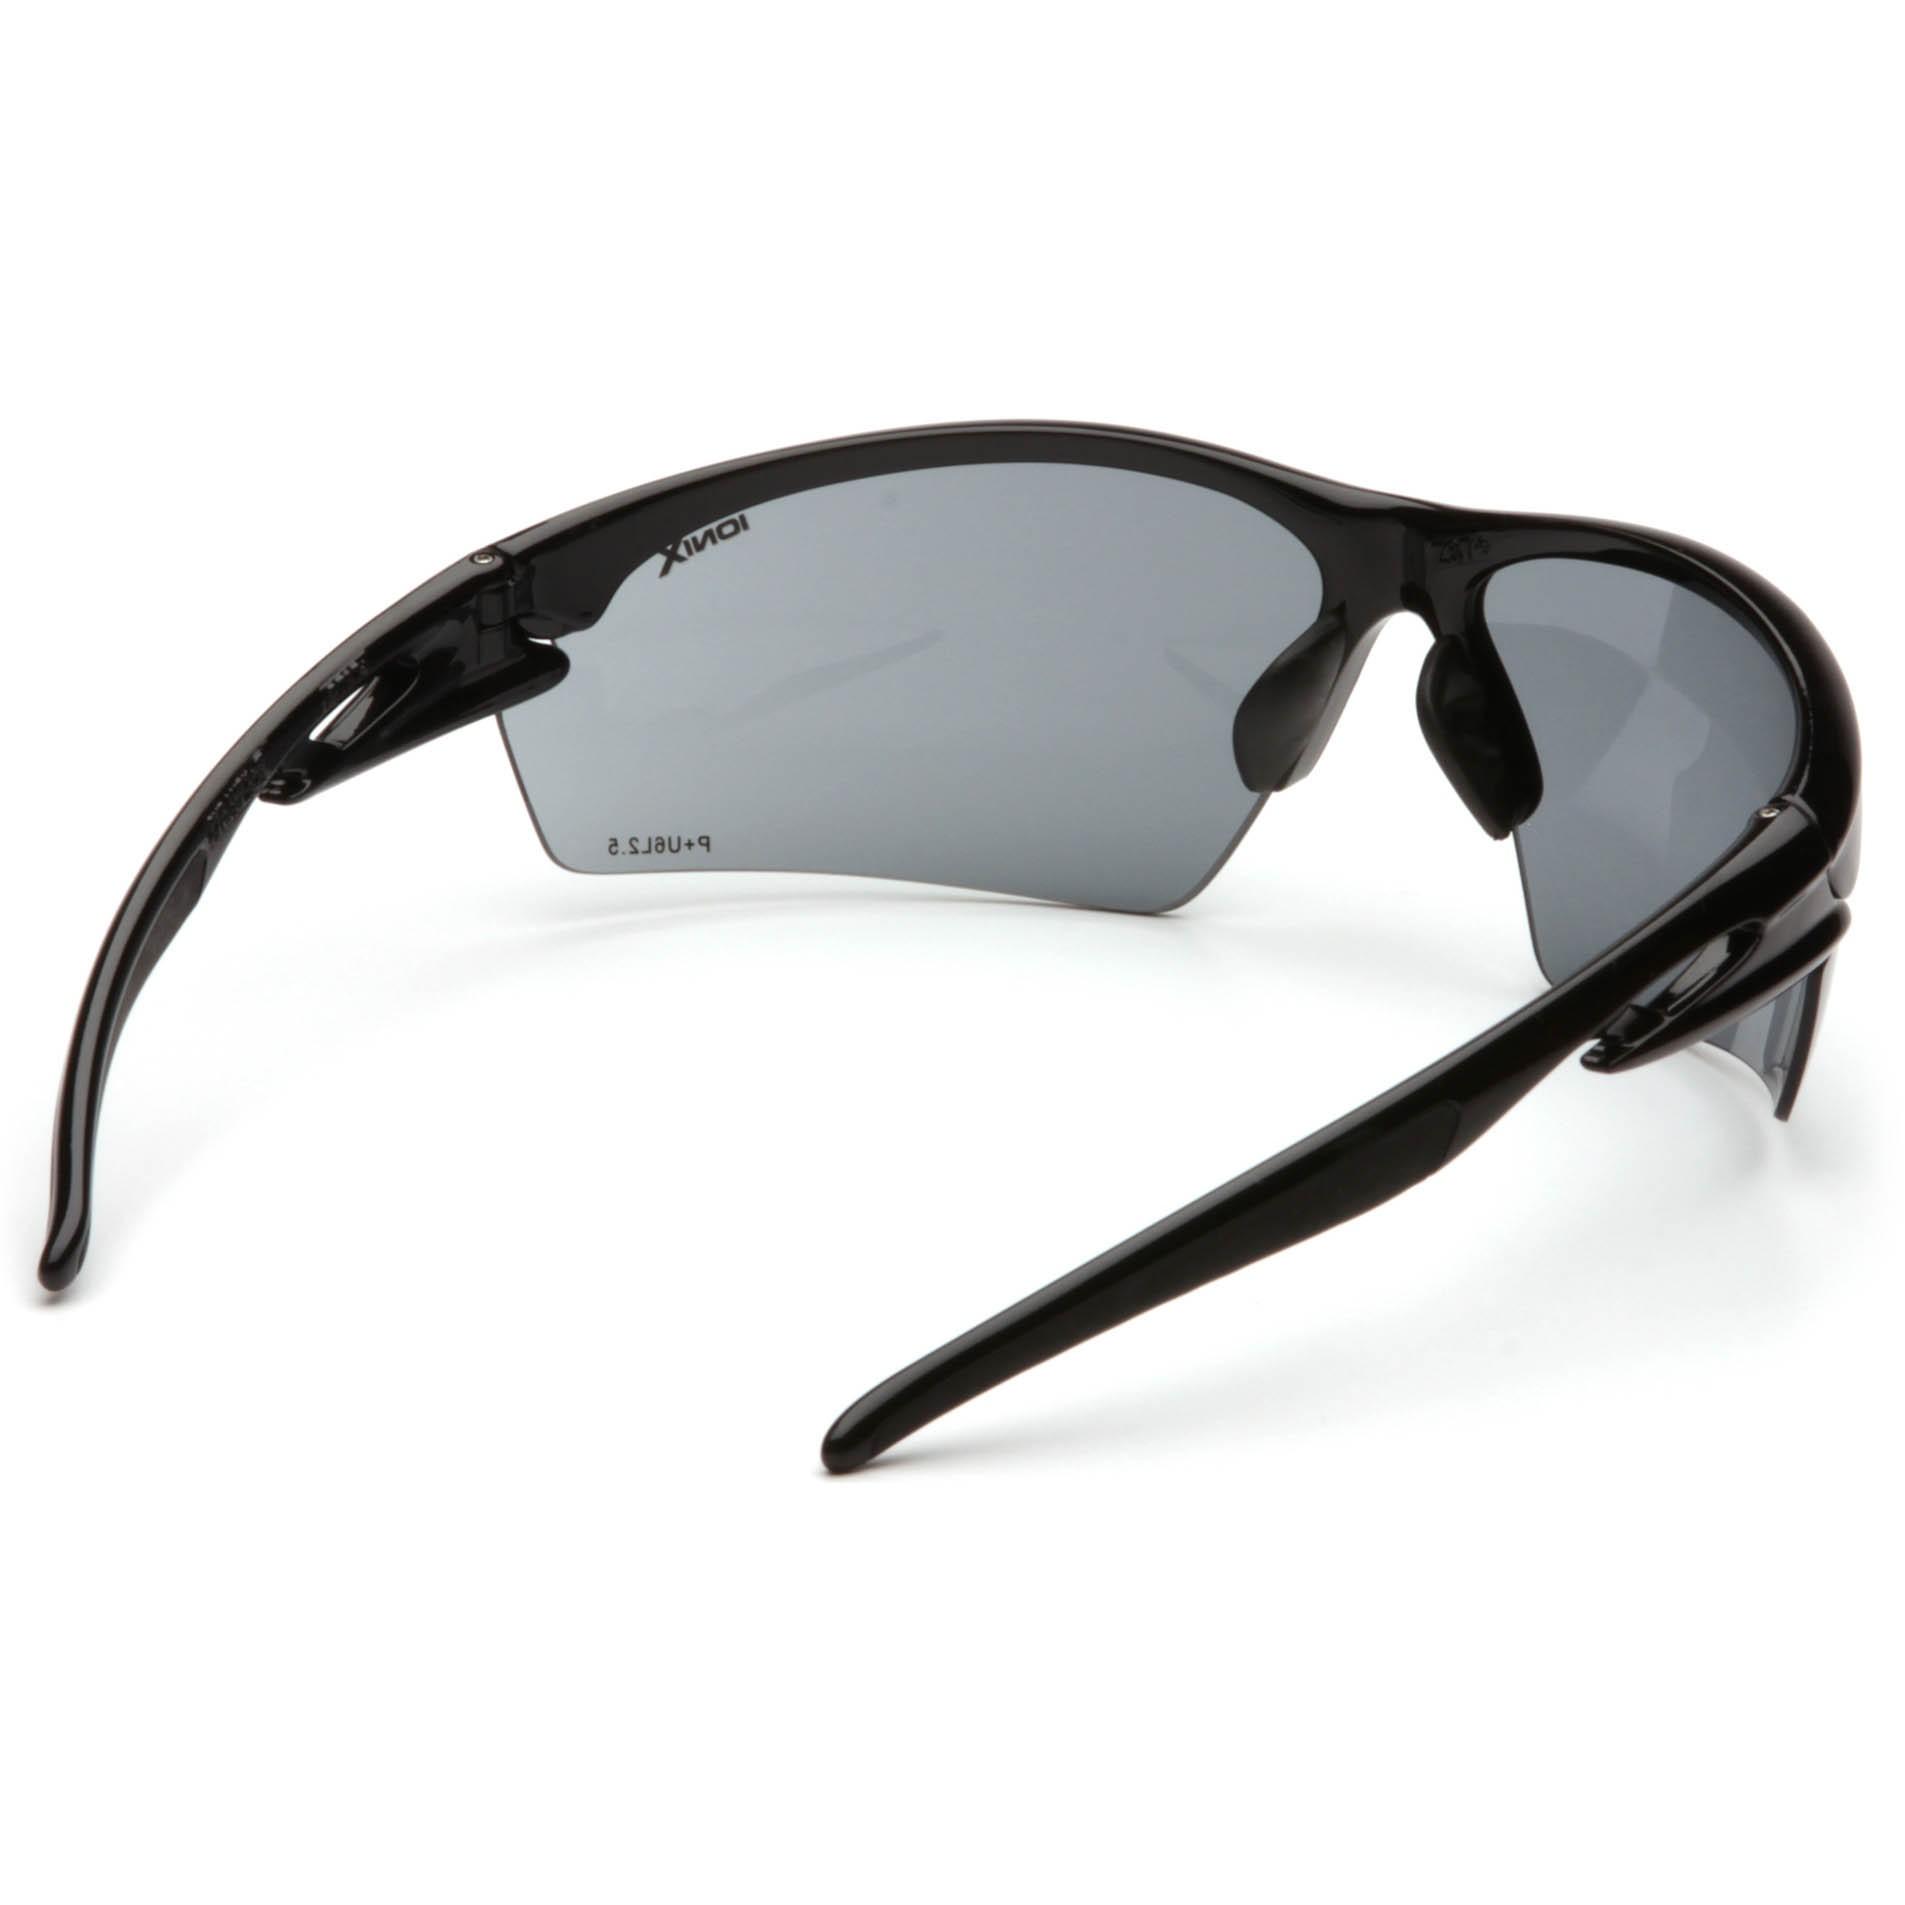 Glasses Gray Frame : Pyramex Ionix Safety Glasses - Black Frame - Gray Lens ...